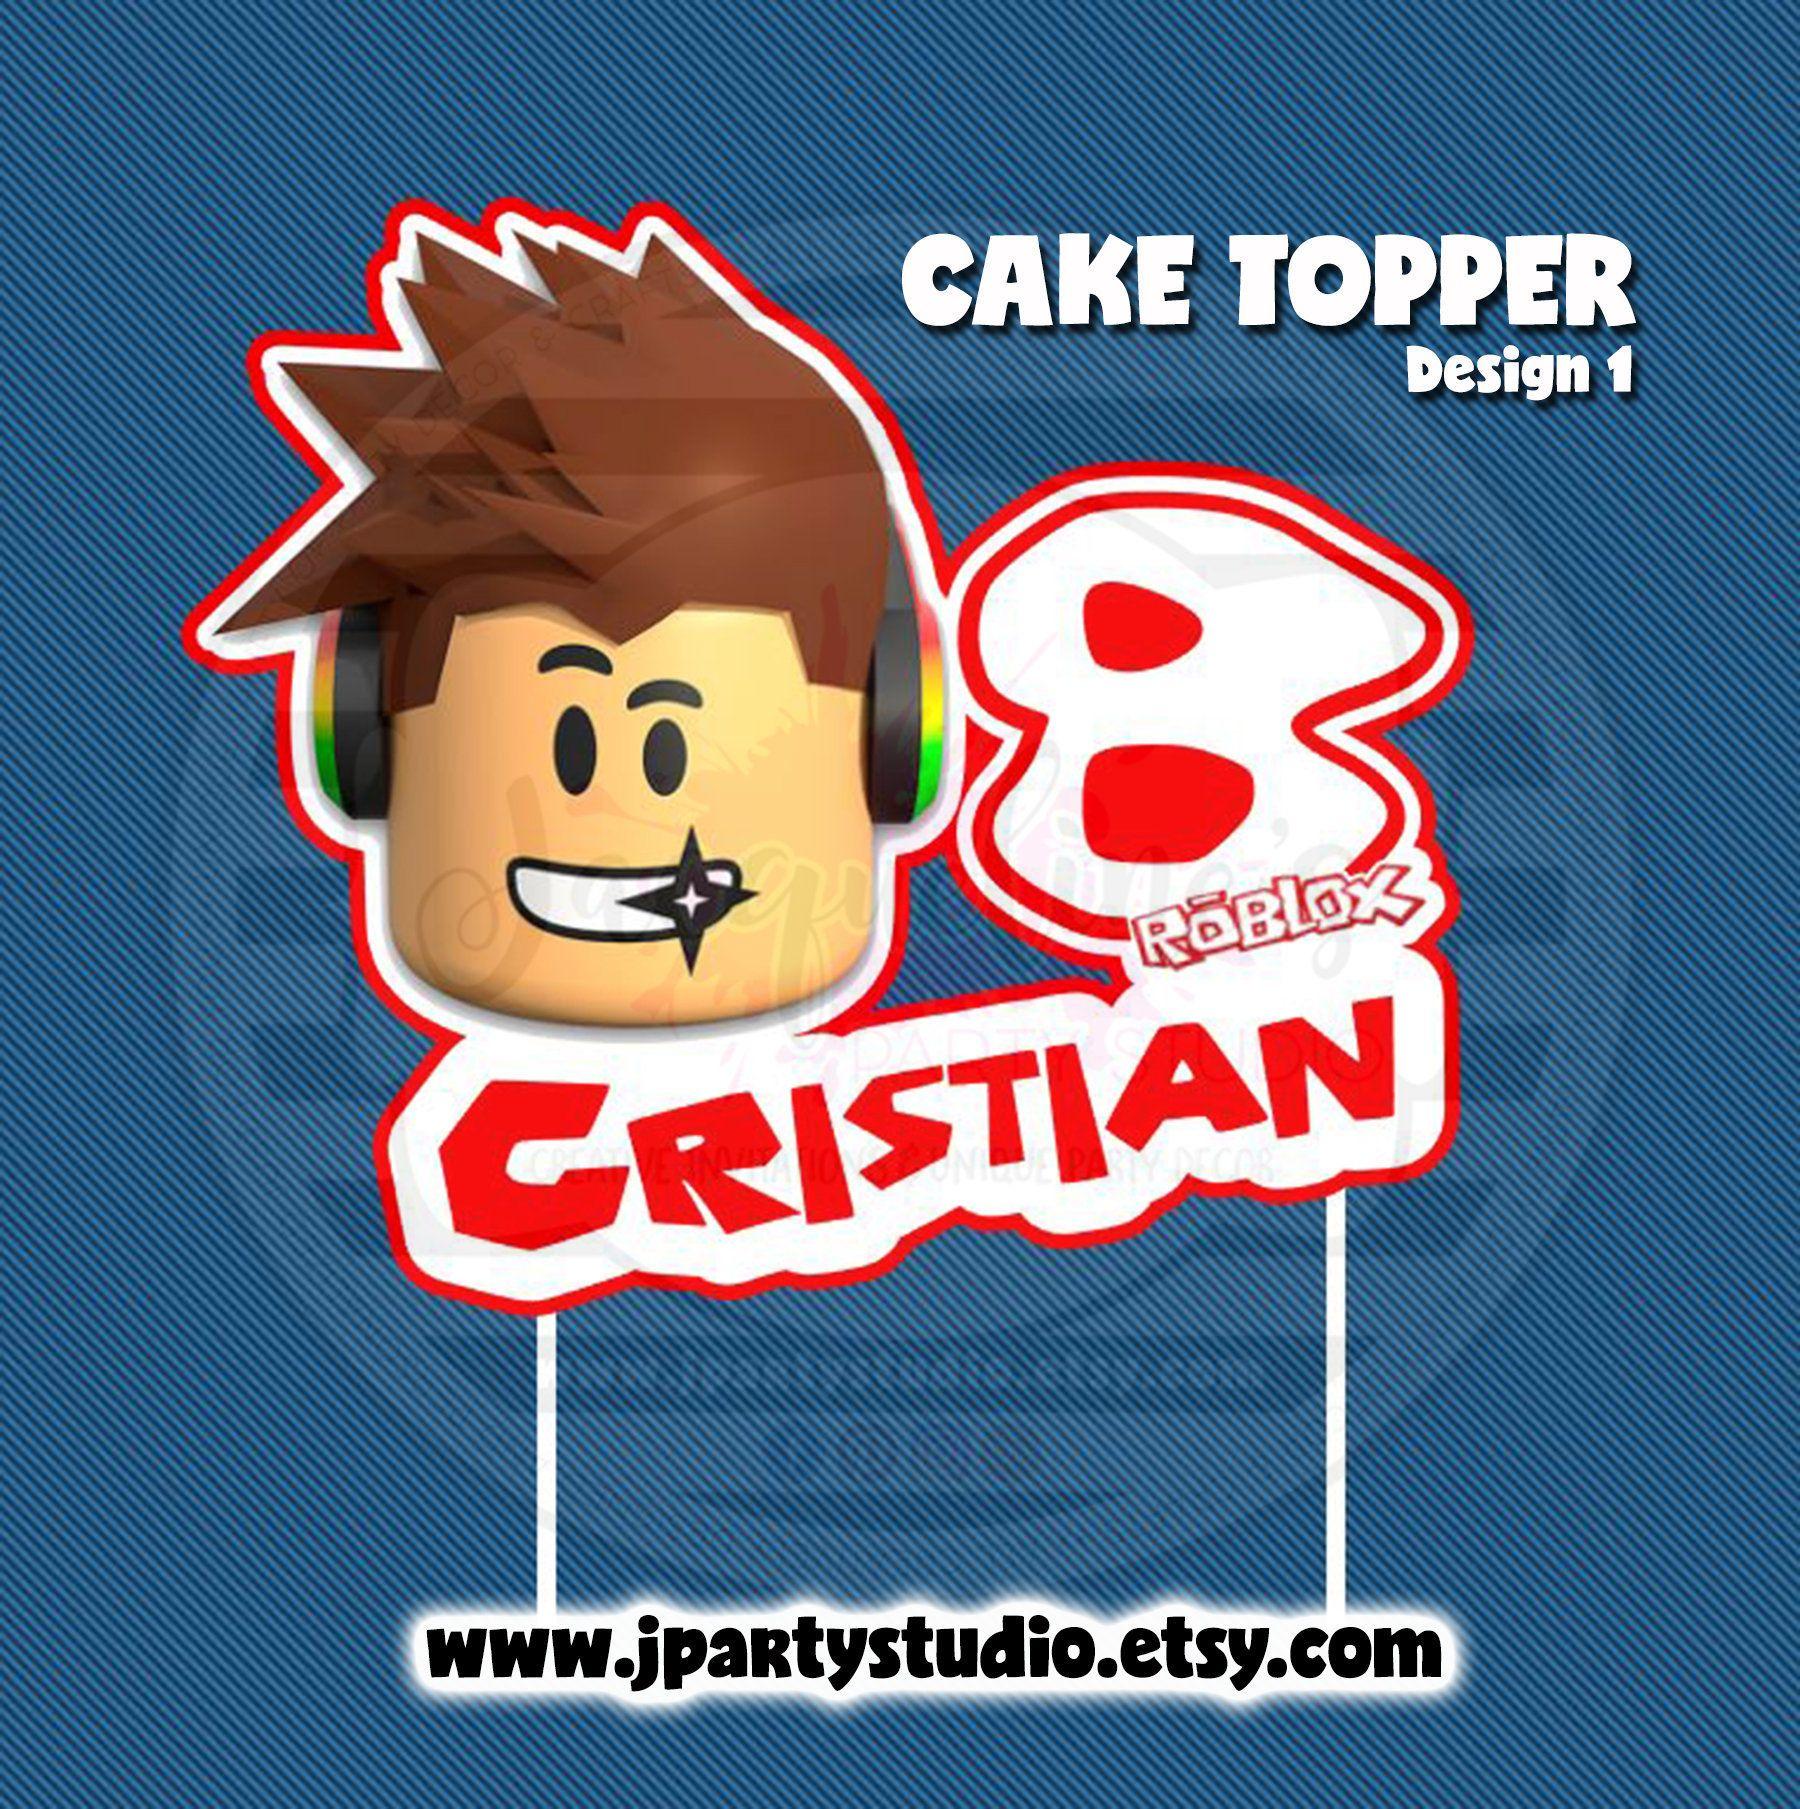 Roblox Cake Topper Video Game Cake Topper Roblox Cake Video